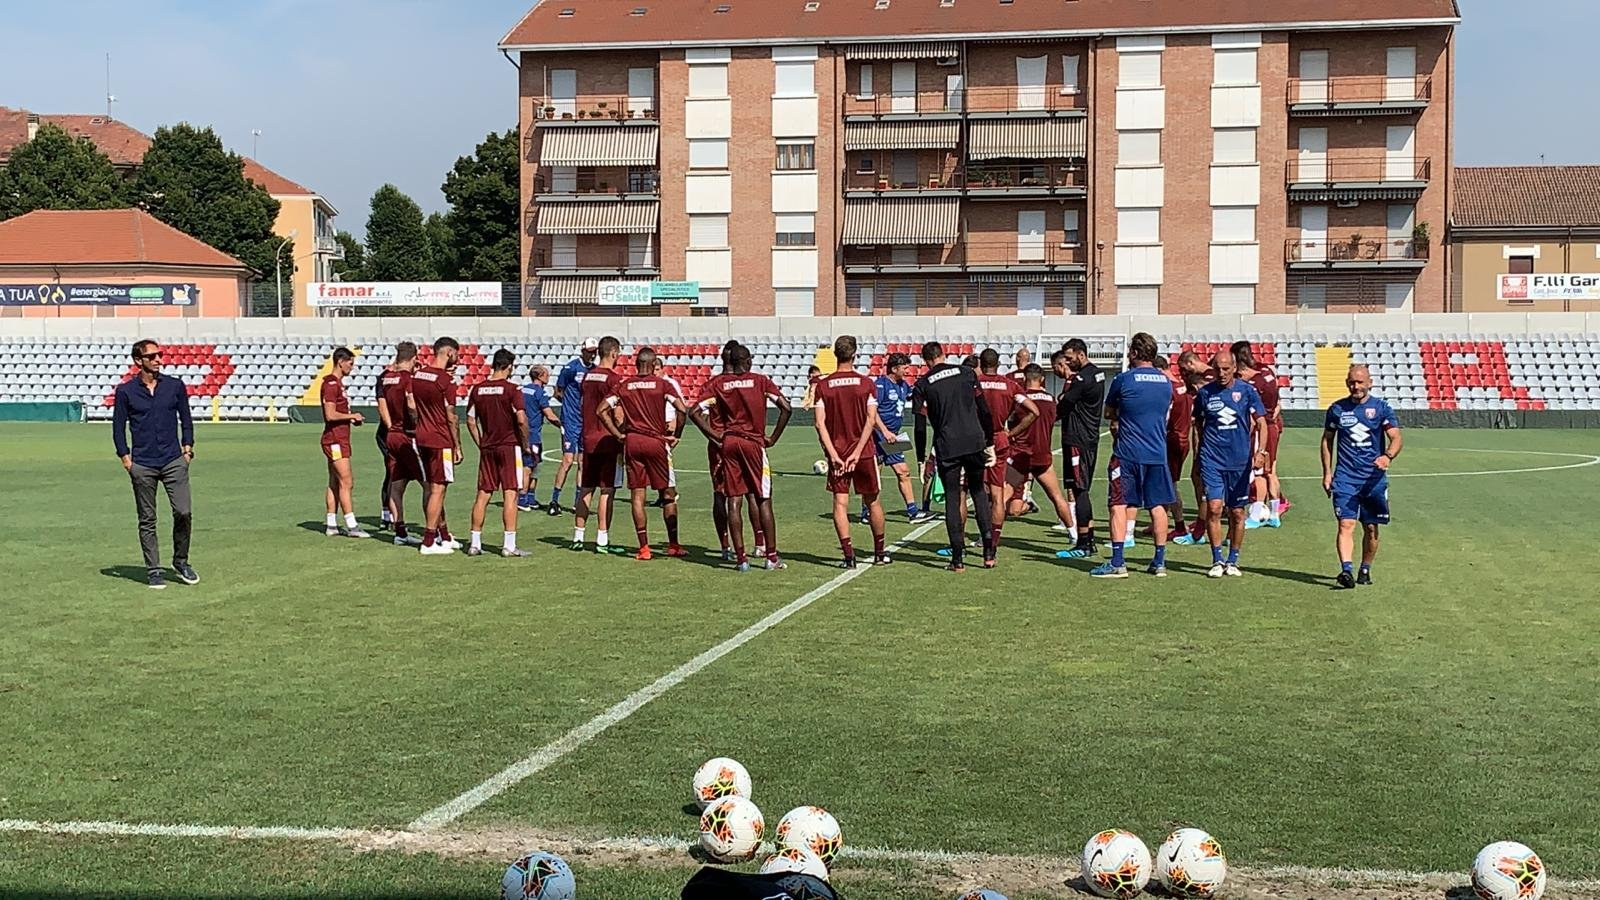 Europa League, Torino - Debrecen giovedì sarà in diretta su Sky Sport